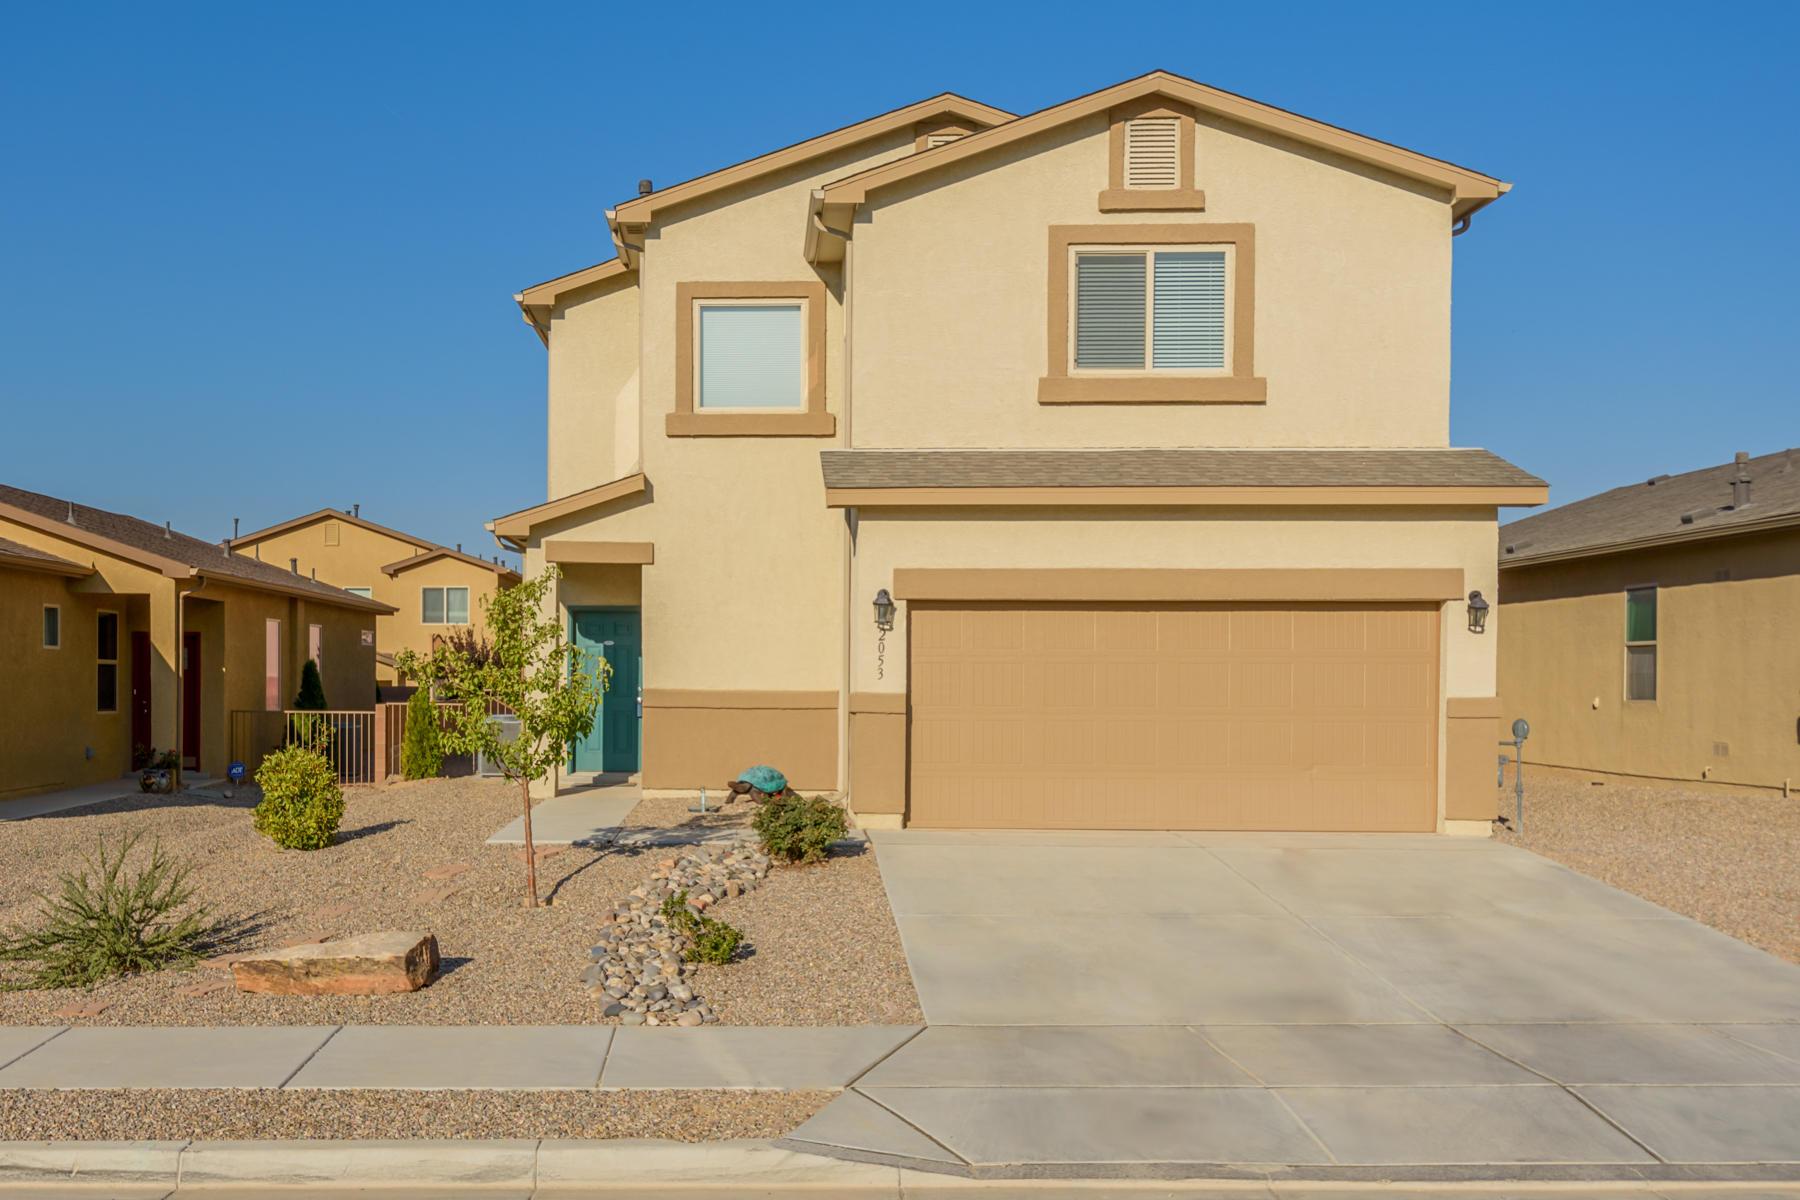 2053 SOLARA Loop NE Property Photo - Rio Rancho, NM real estate listing